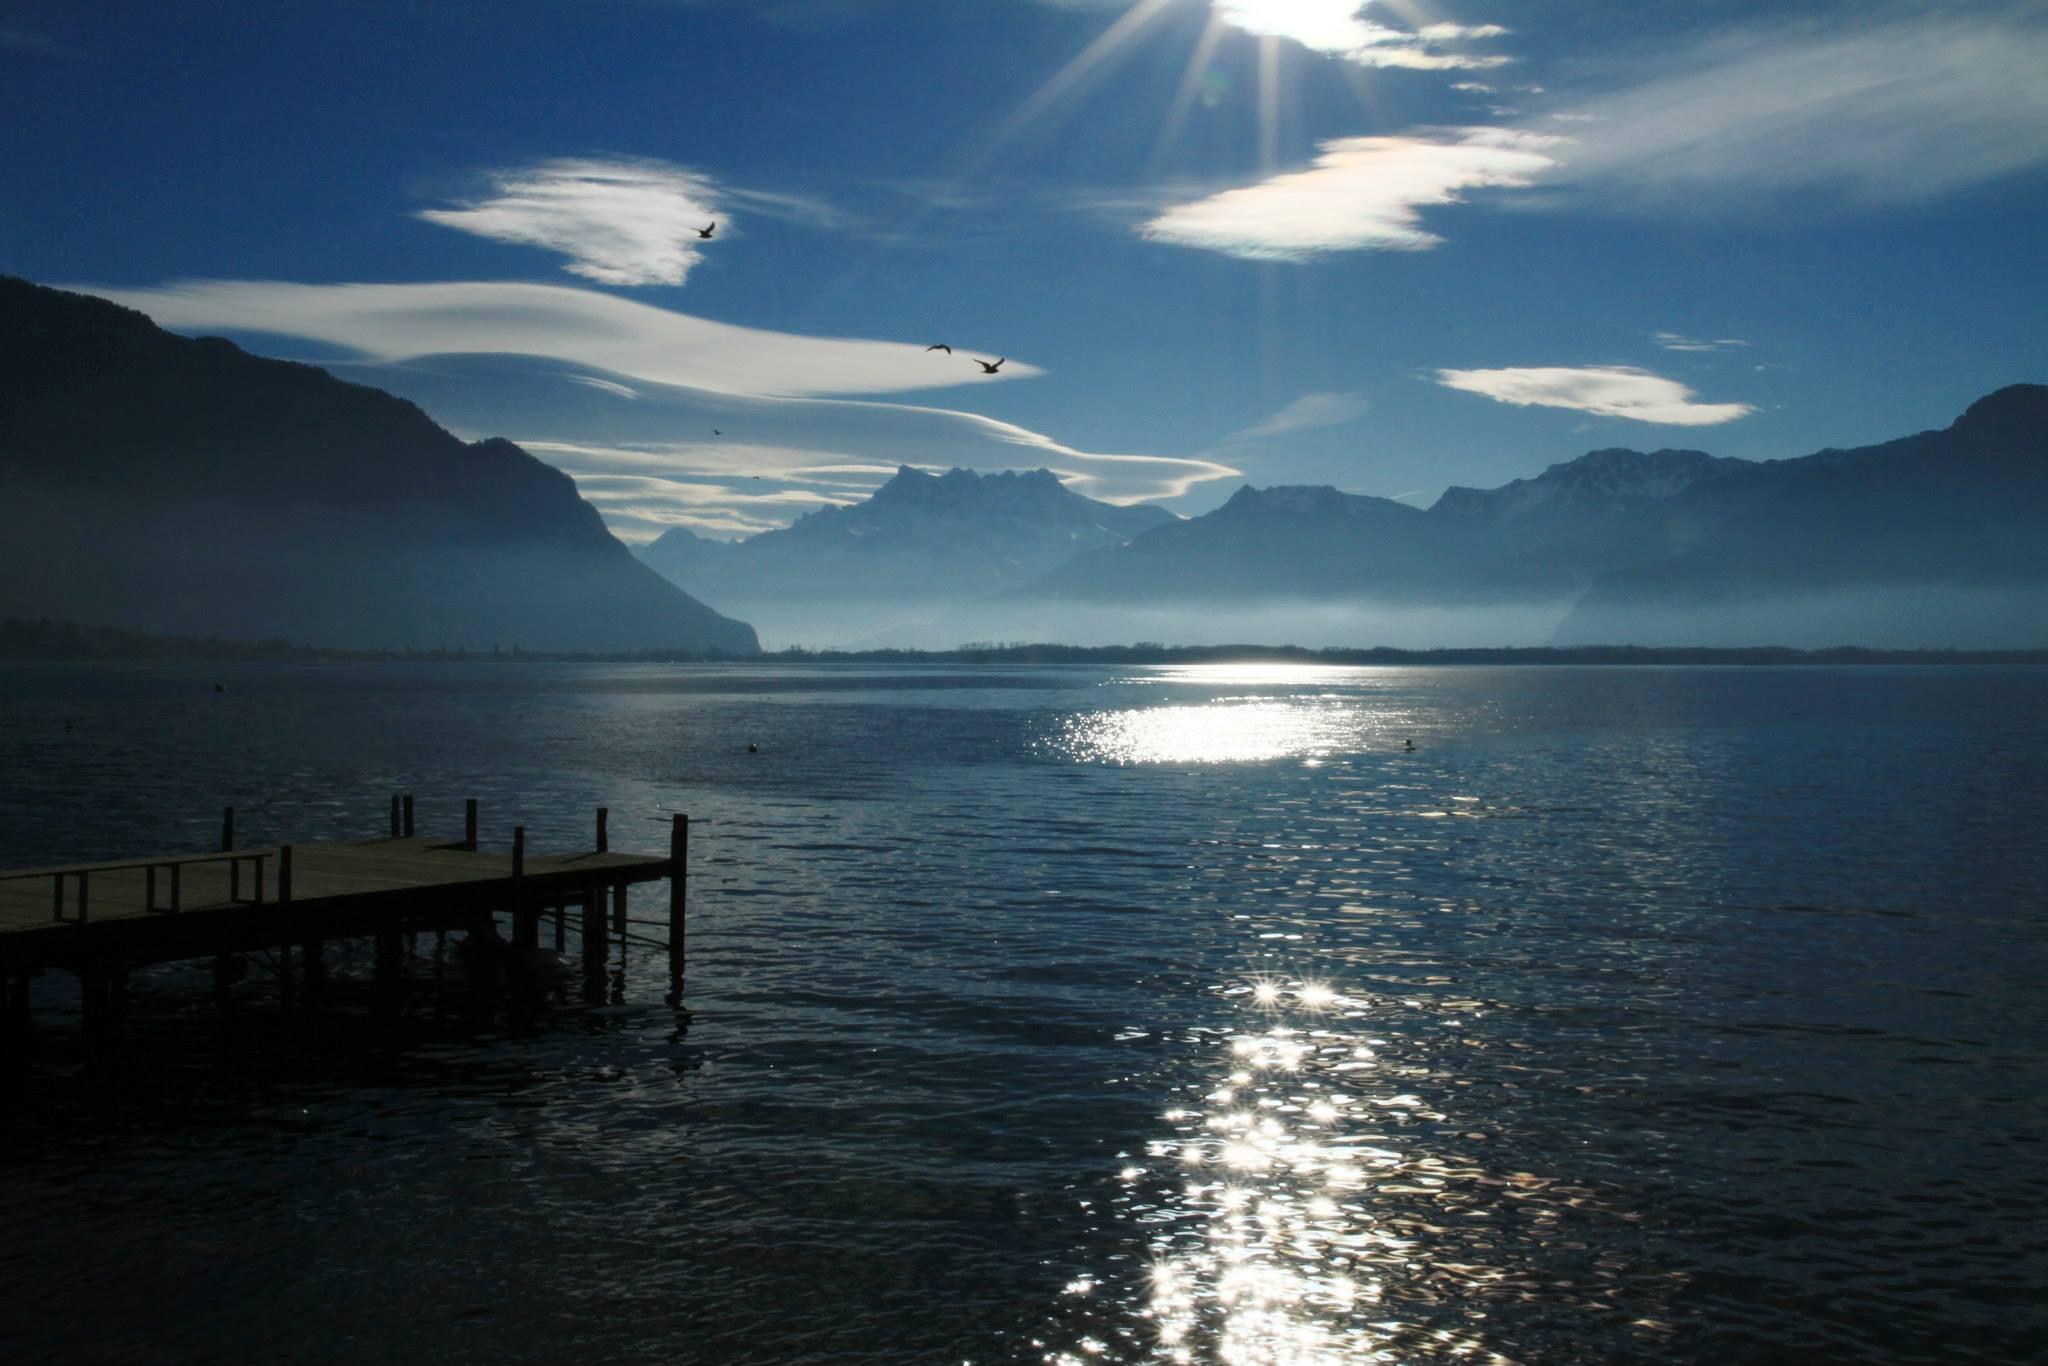 Switzerland, Leman, lake, Dents du Midi, Ekaterina Eicher (Velichko)